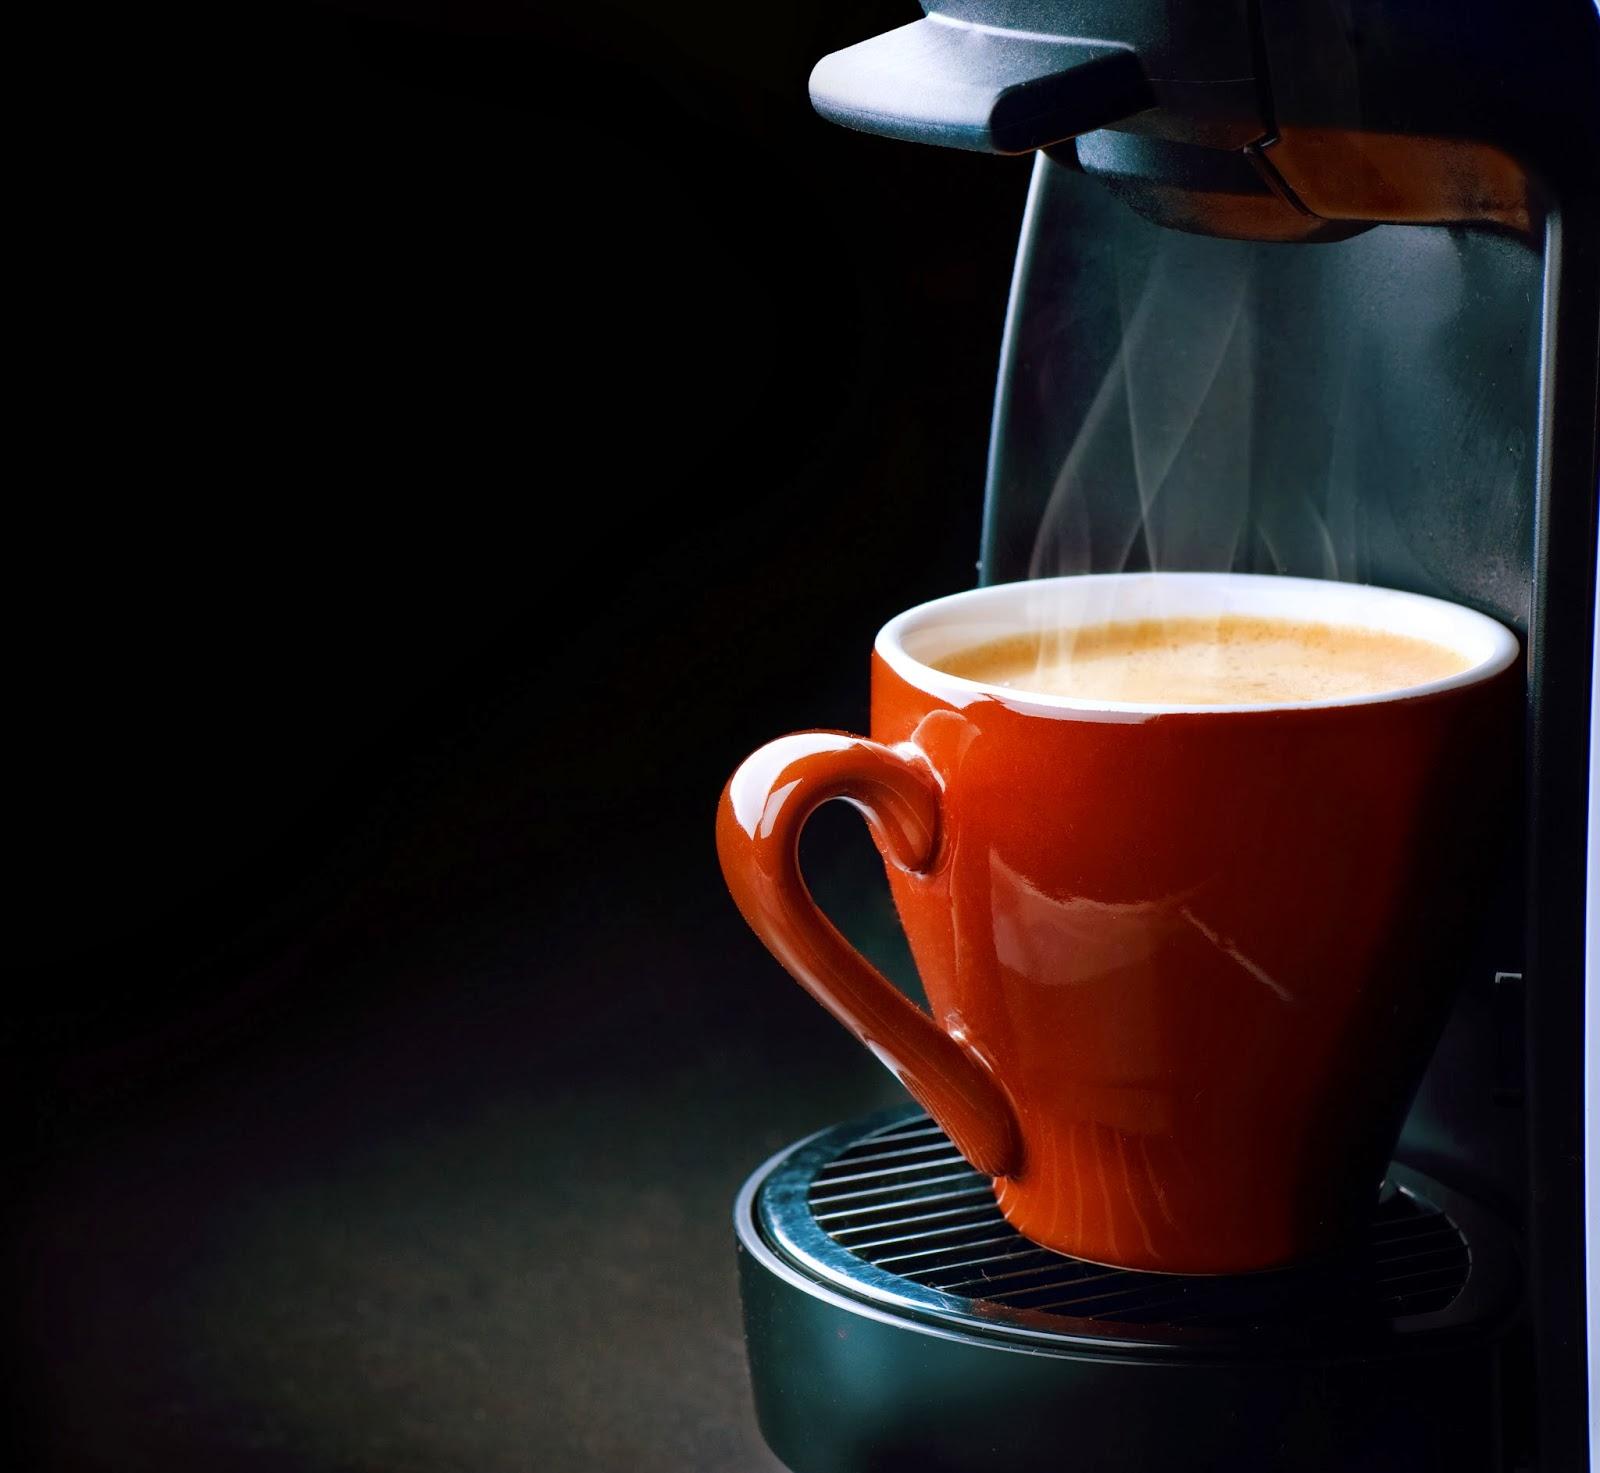 Steaming Cup Of Coffee A steaming cup of coffee